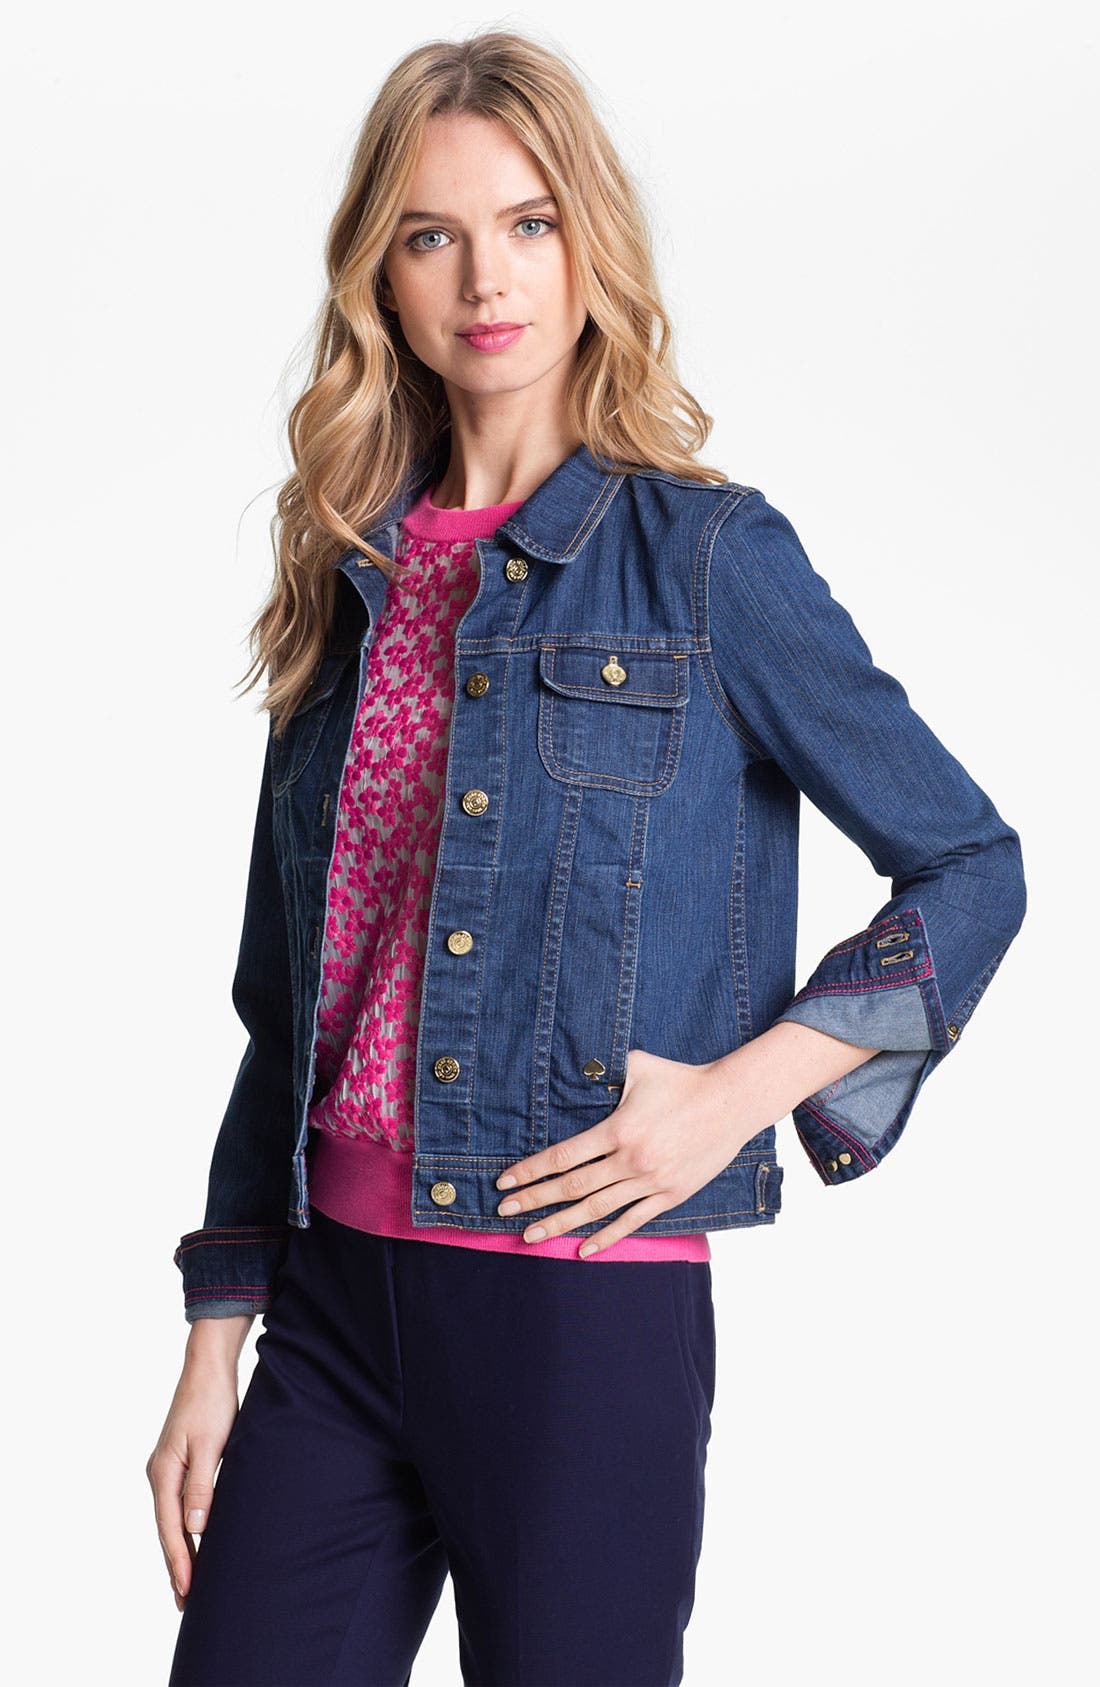 Alternate Image 1 Selected - kate spade new york 'broome street' denim jacket